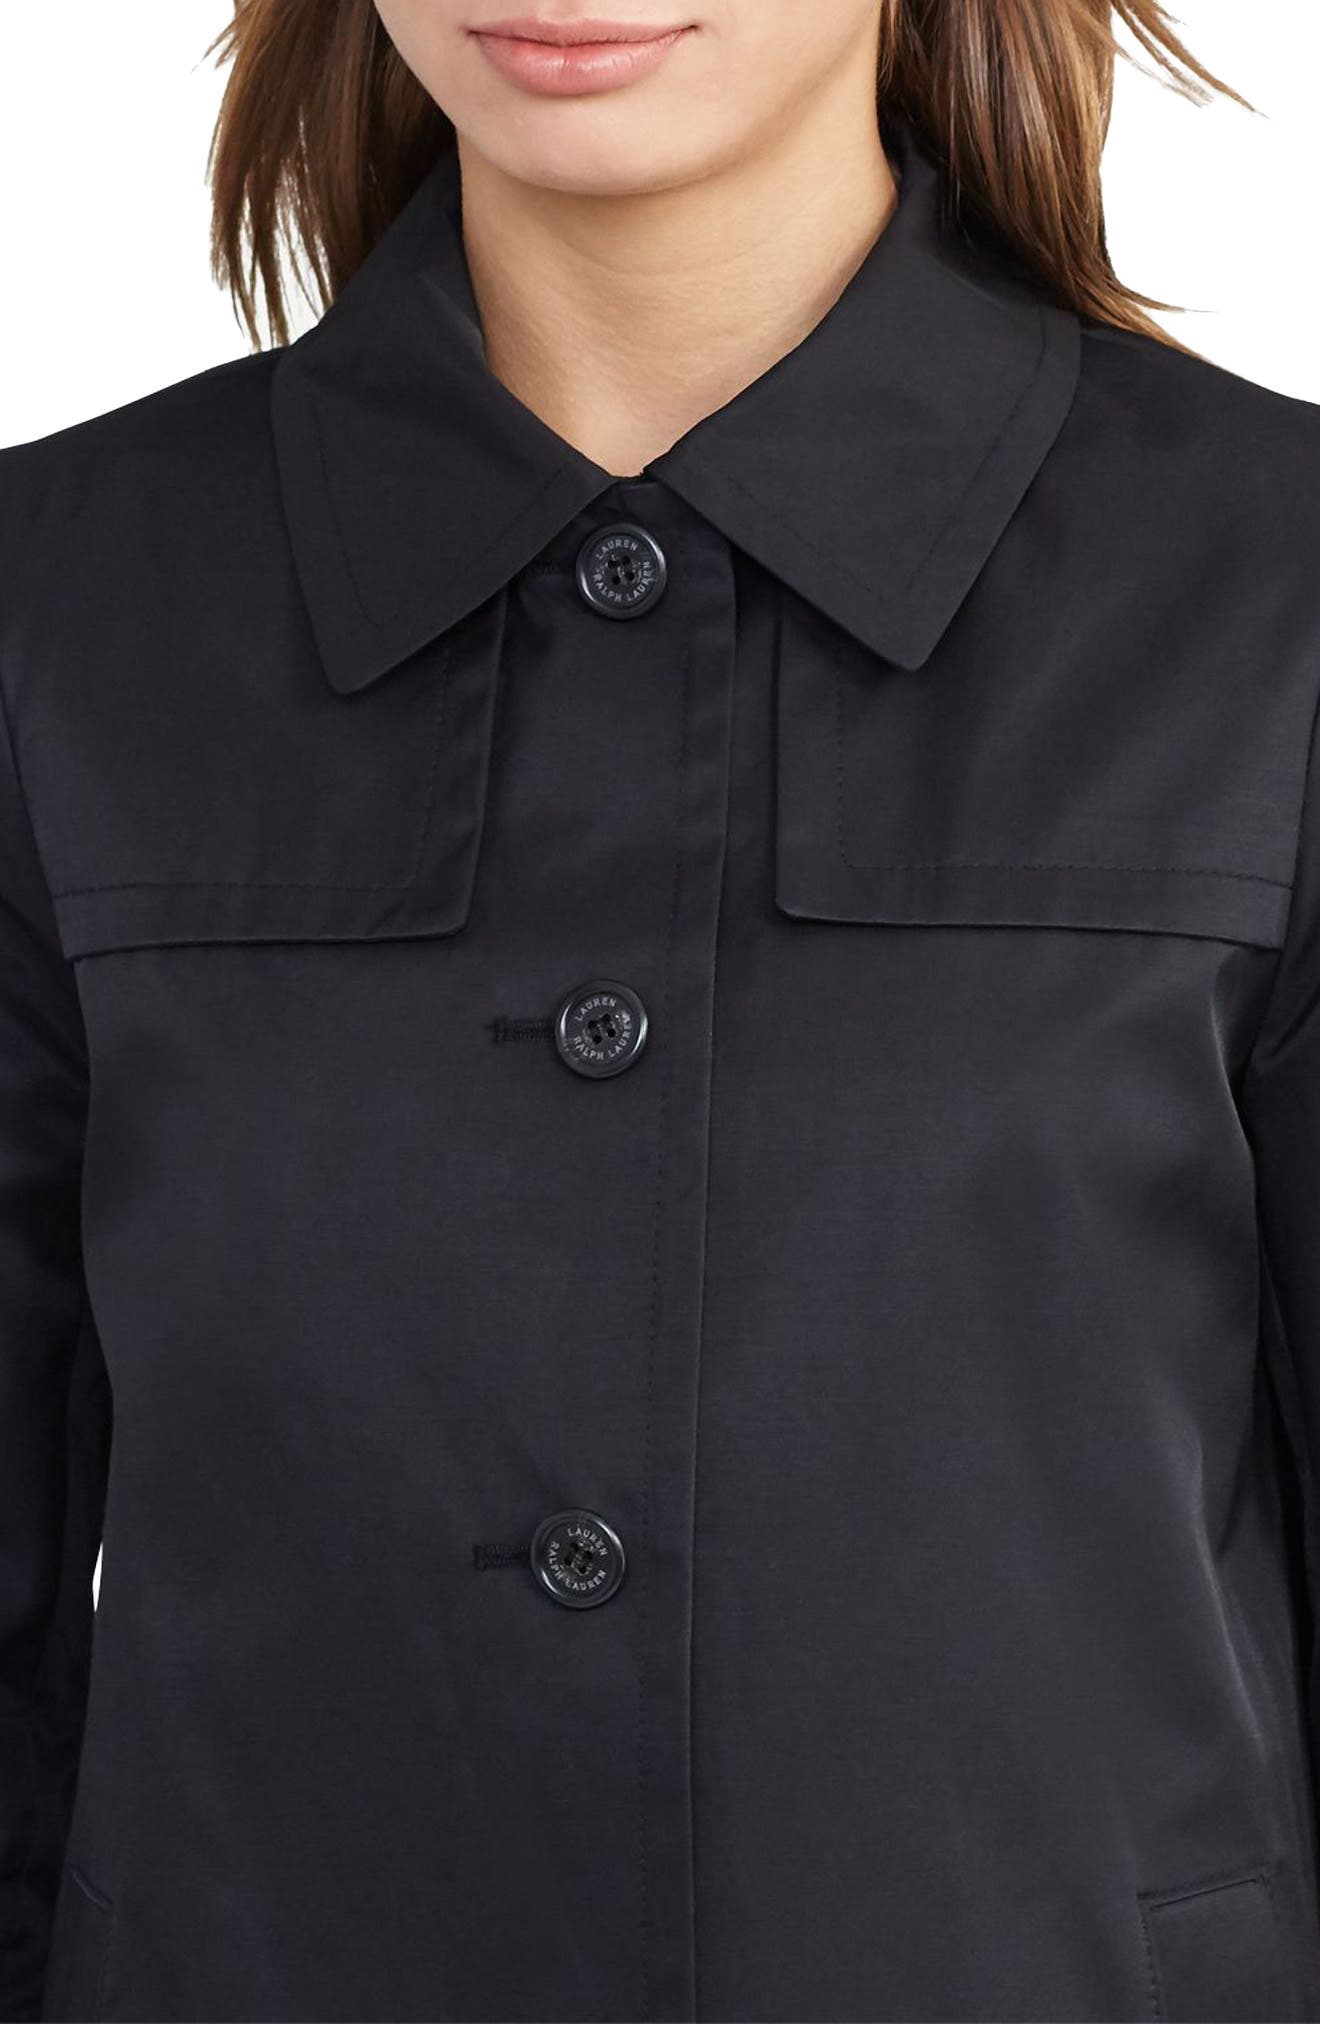 A-Line Trench Coat,                             Alternate thumbnail 4, color,                             Black